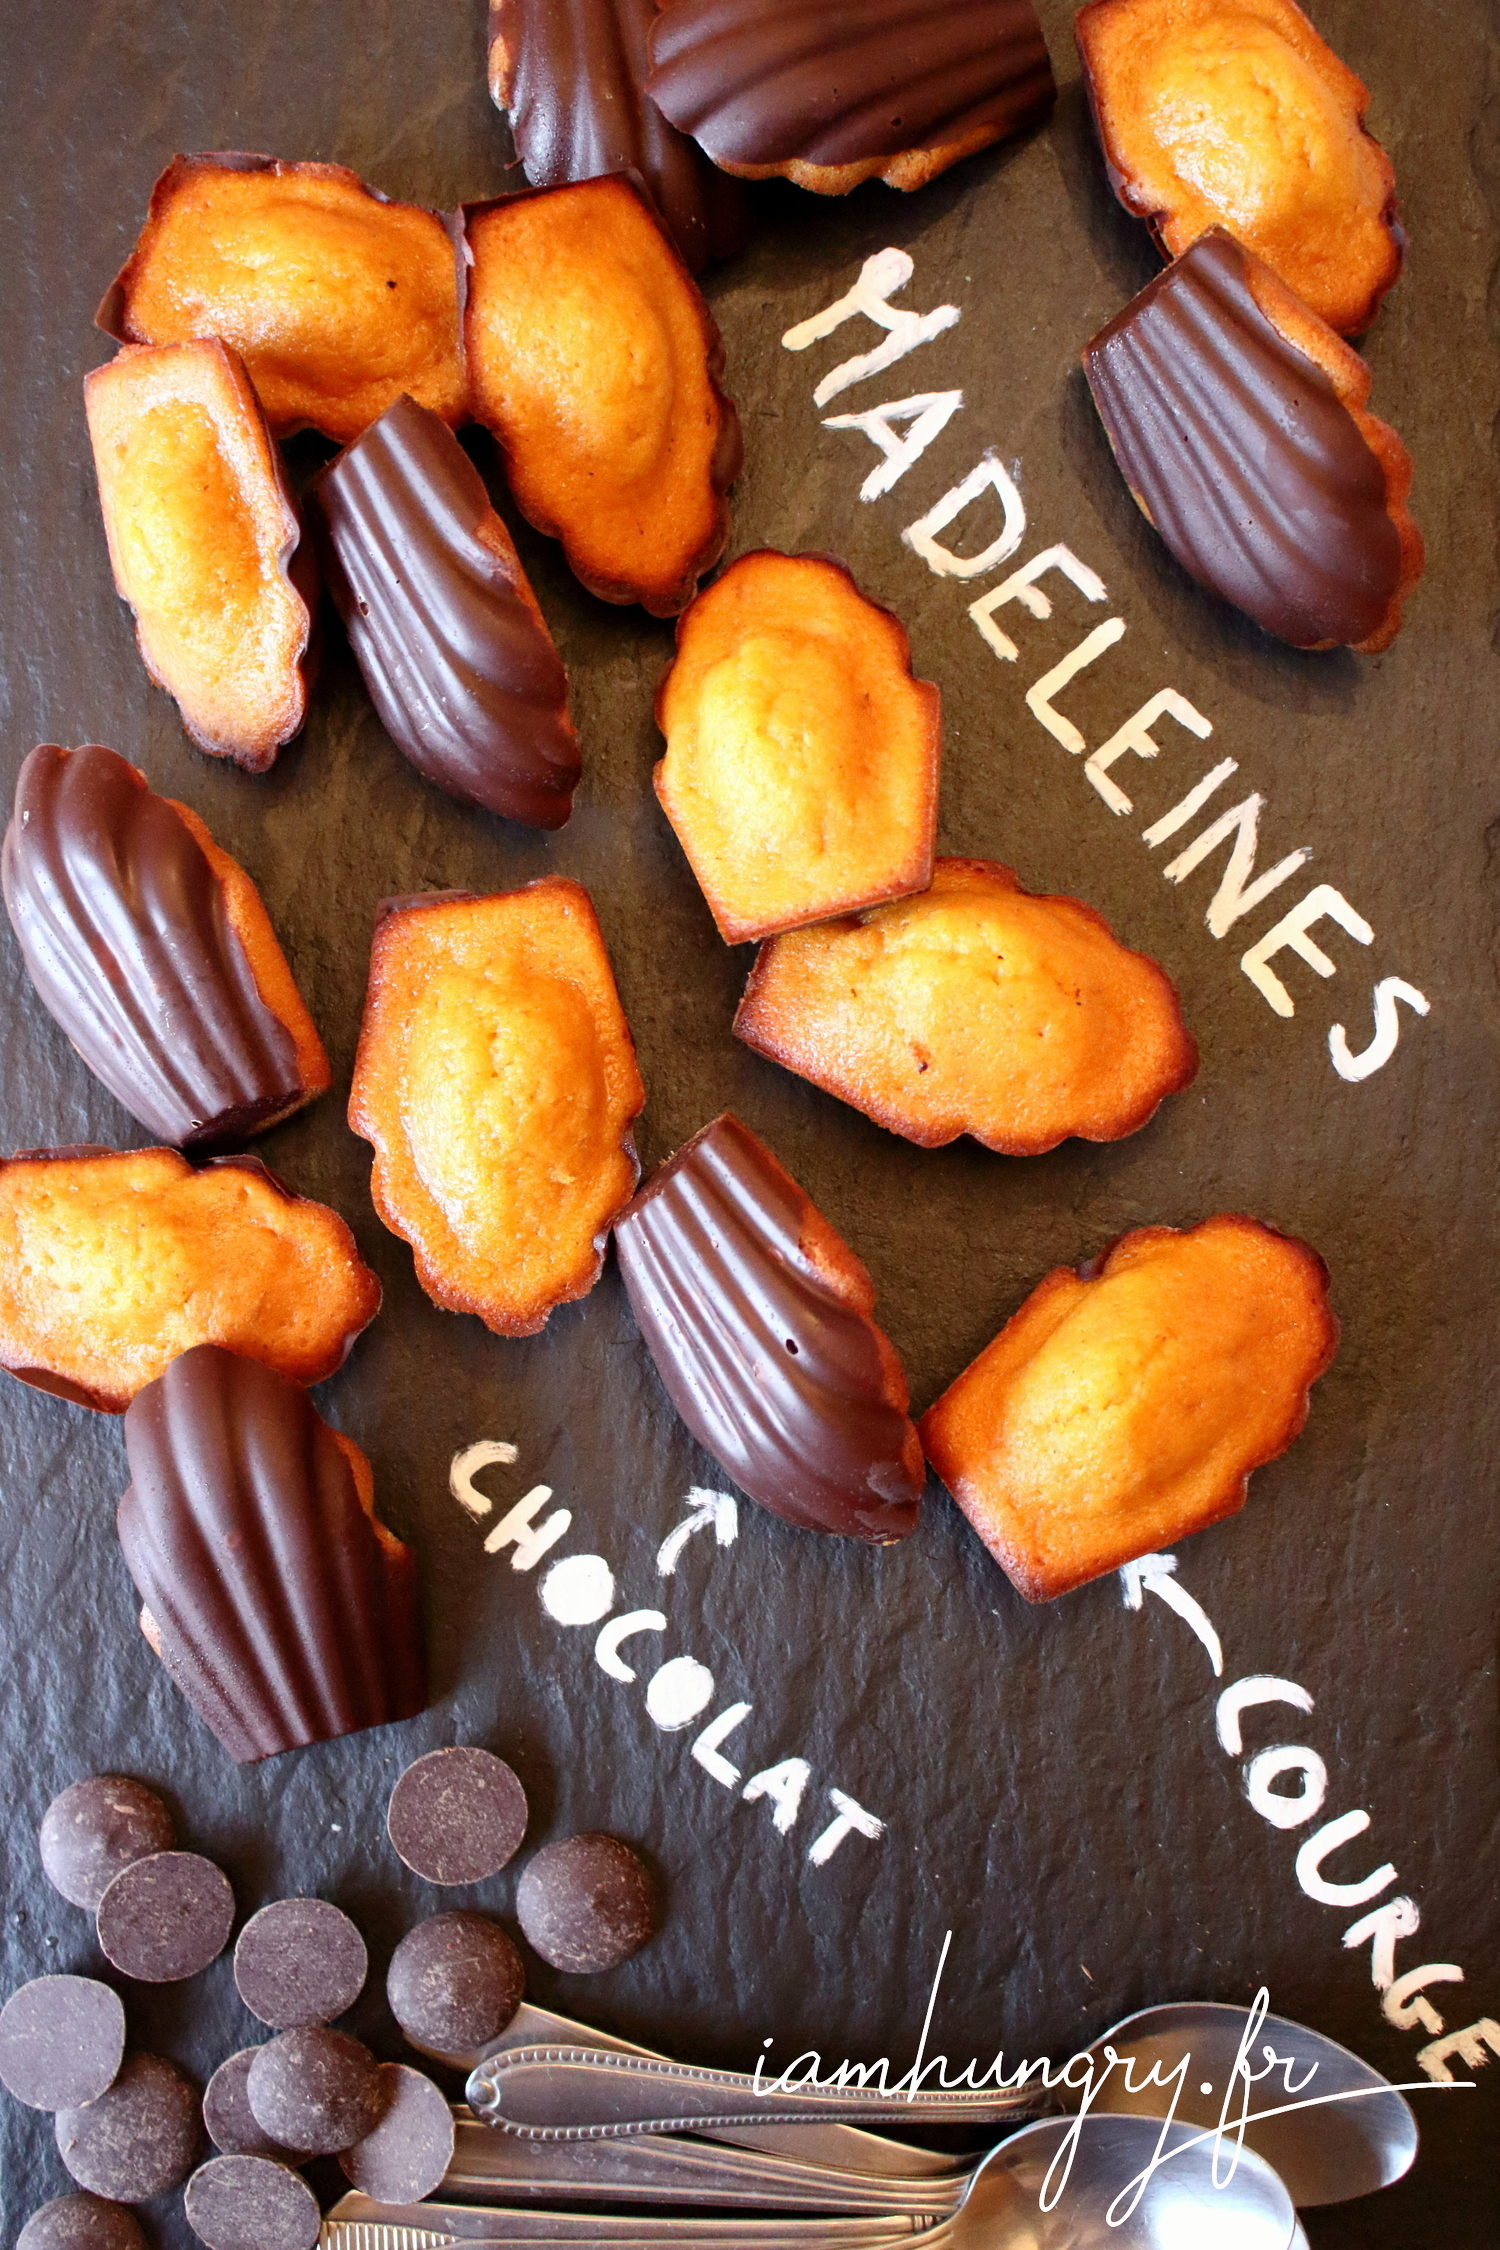 Madeleines courge et coque en chocolat